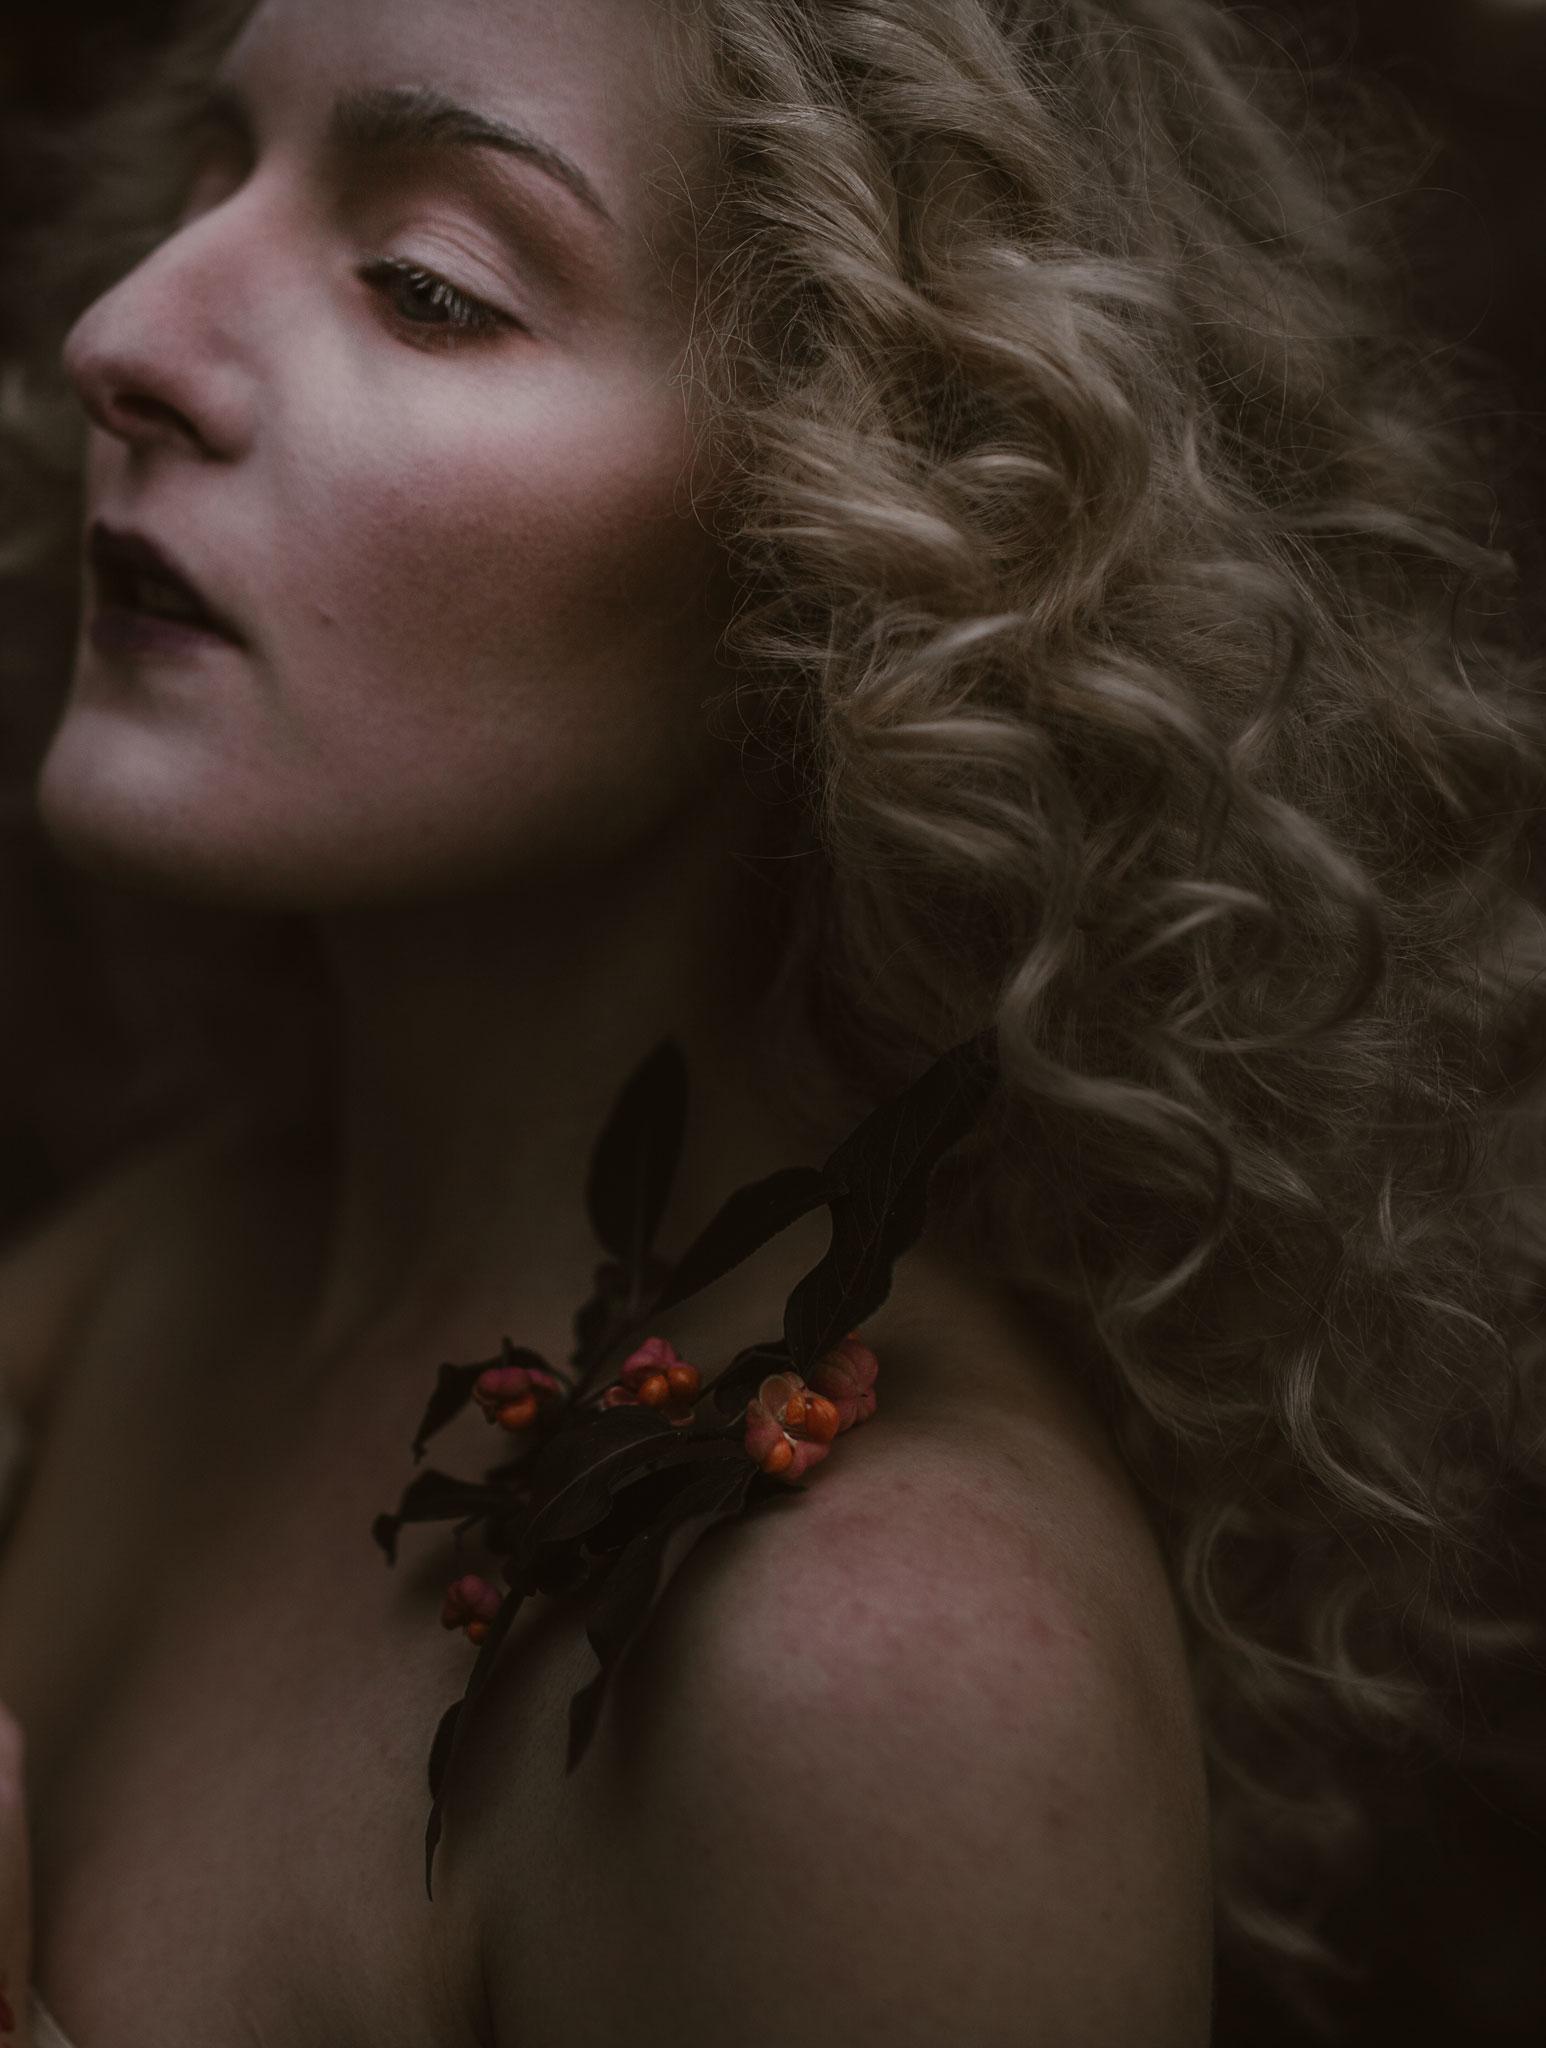 pale-witch-197fb.jpg